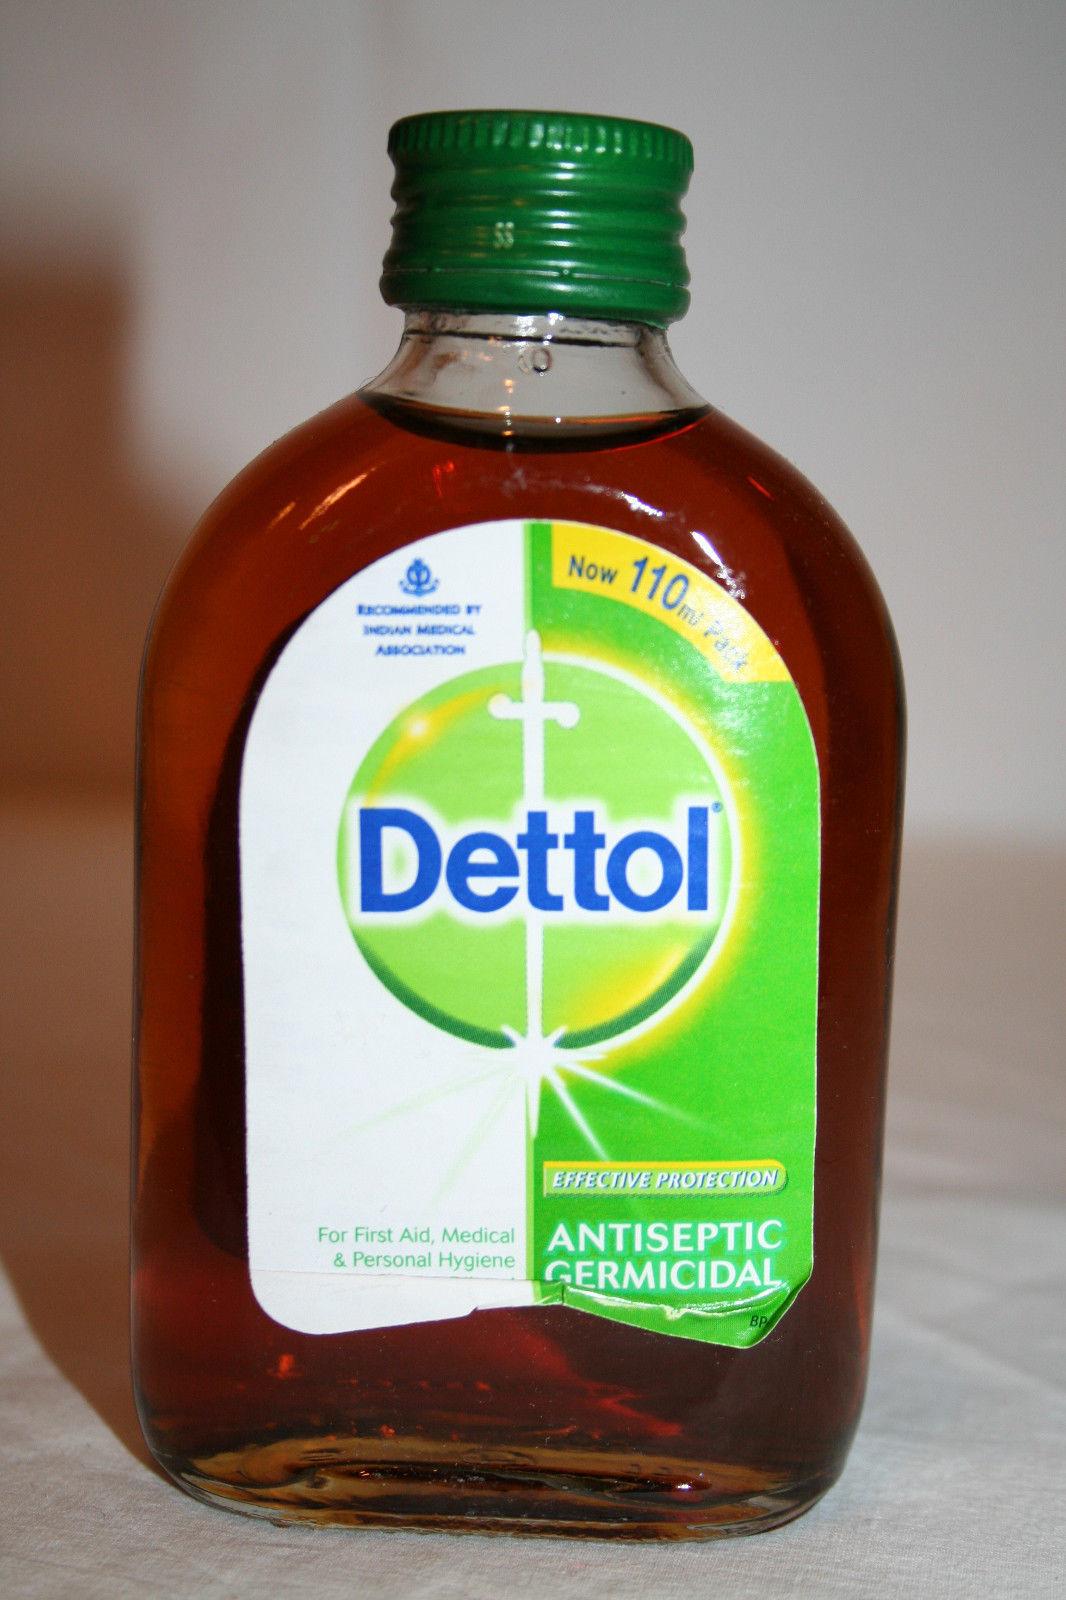 Productdetail Rm Variety Shop Dettol Antiseptic Liquid 100 Ml 110